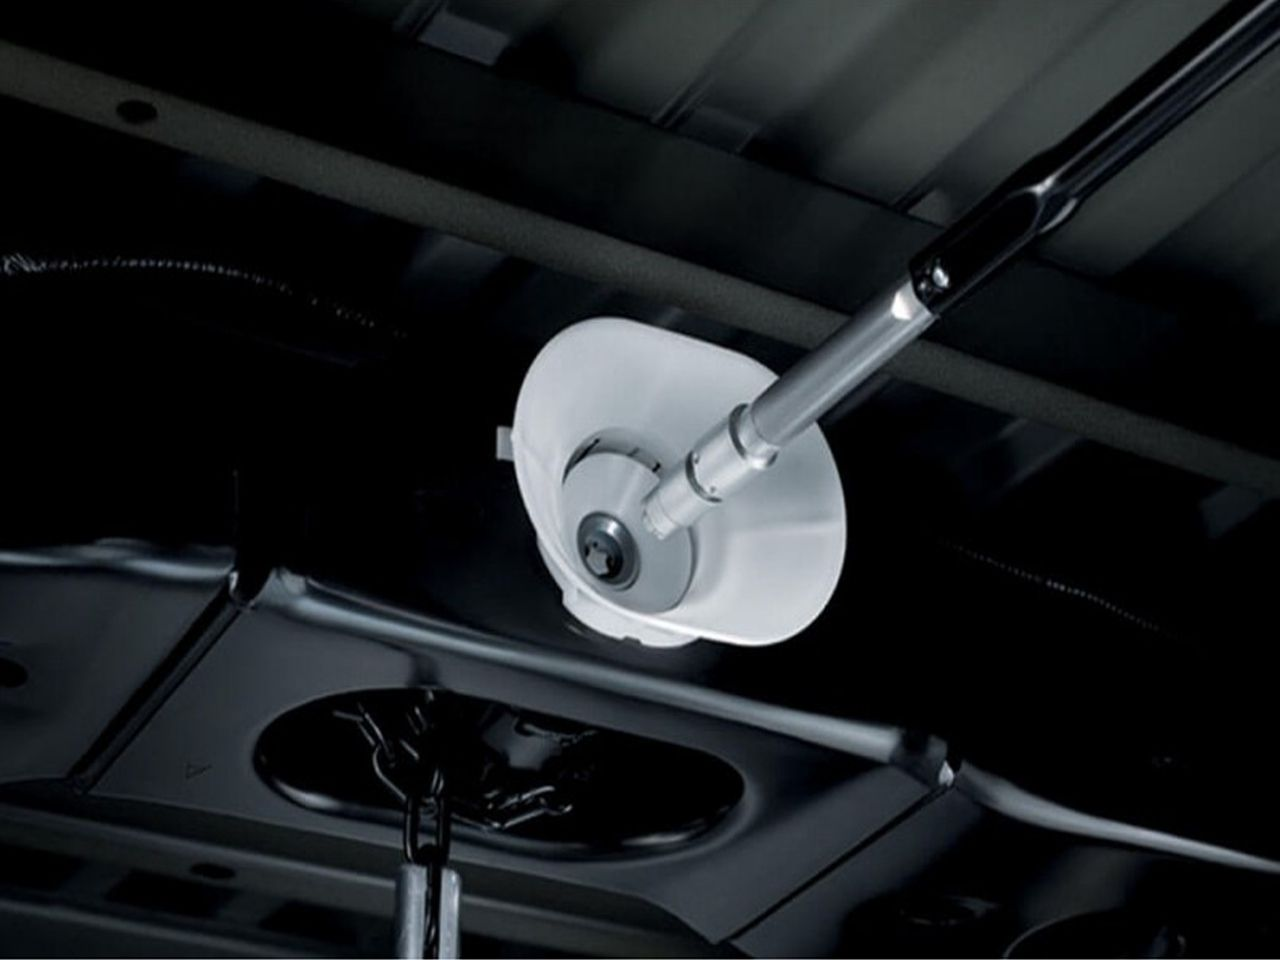 Trava Antifurto do Estepe Hilux STD SR SRV SRX Chassi Cabine Simples  - Mirai Peças Toyota